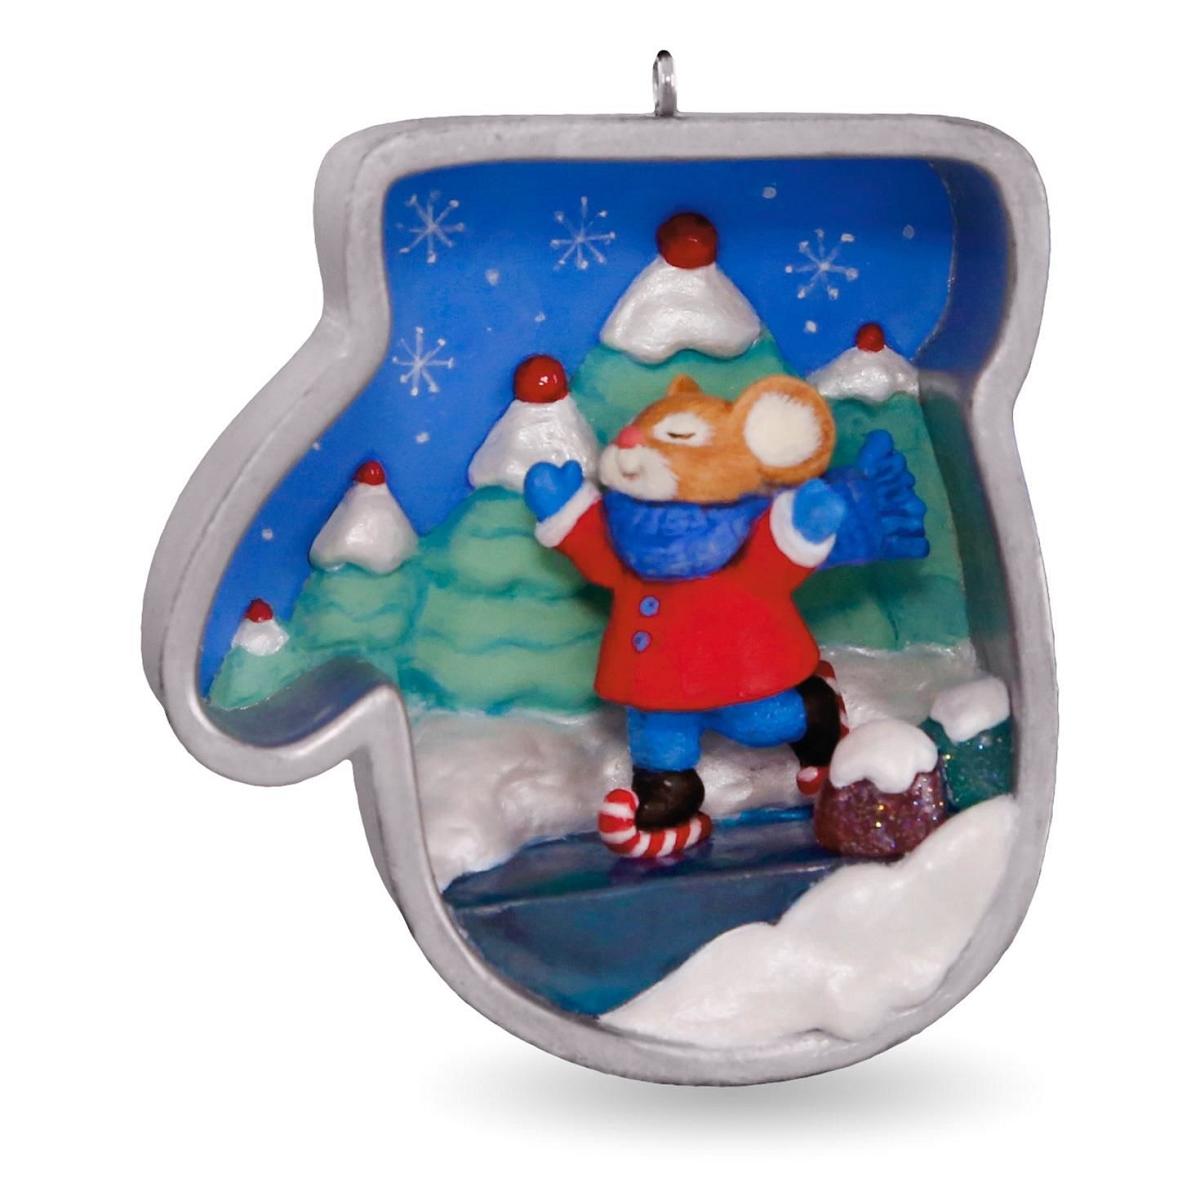 2016 Cookie Cutter Christmas Hallmark Keepsake Ornament ...